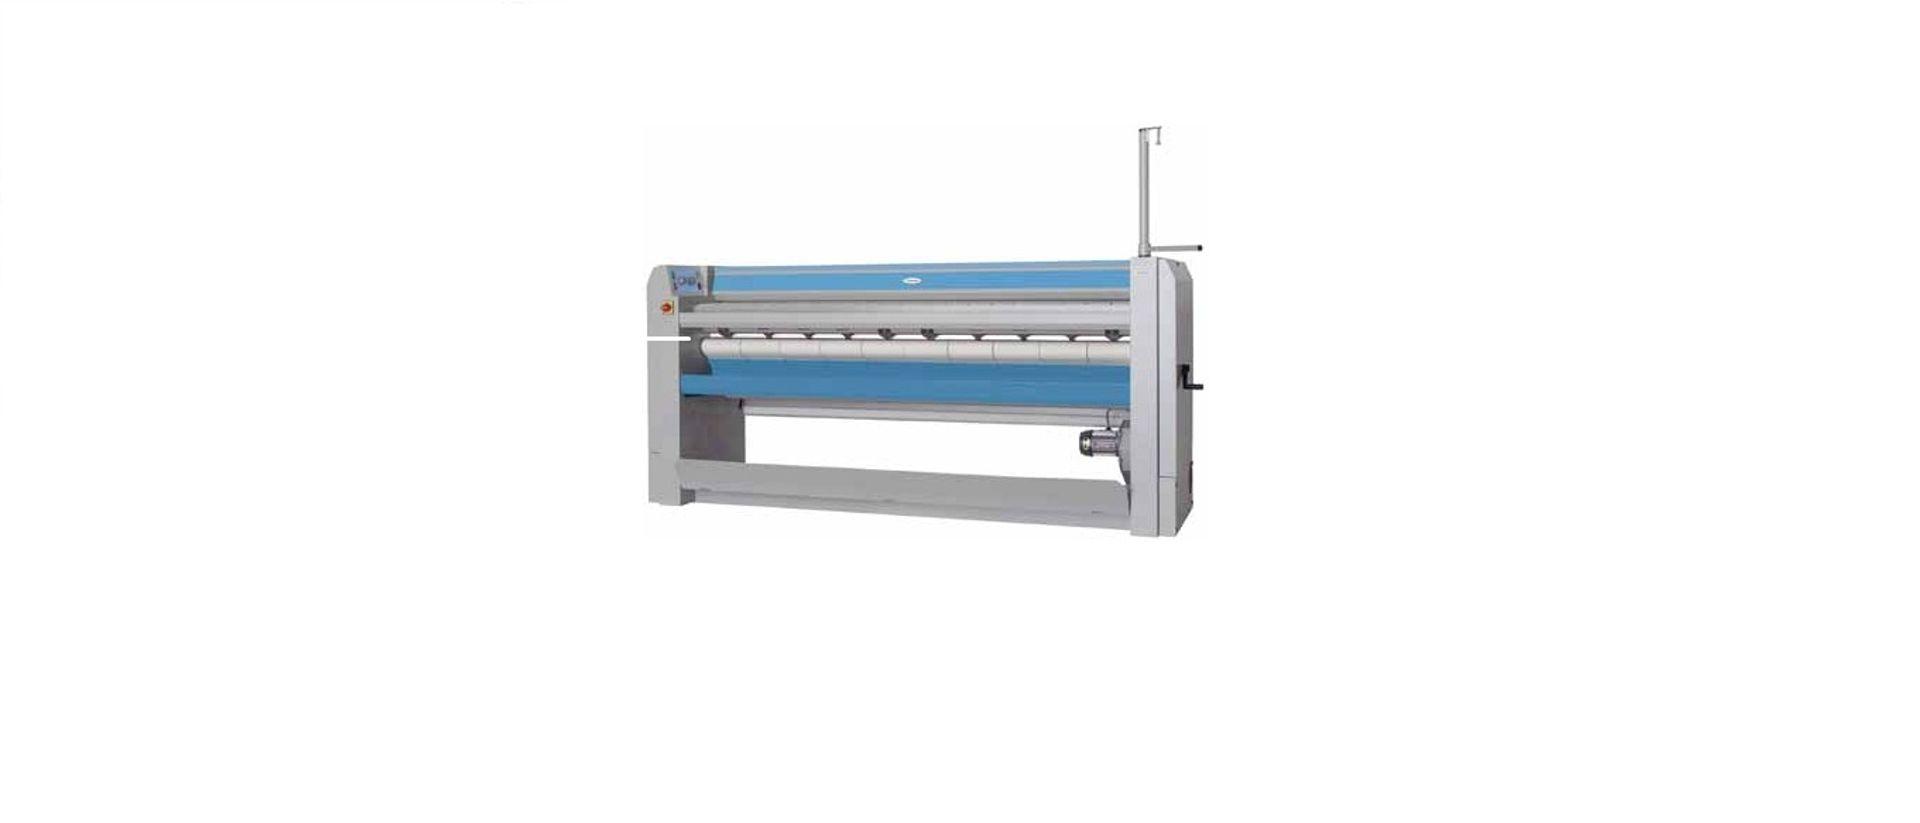 Electrolux Ironer IC43316 - LV Engineering Service